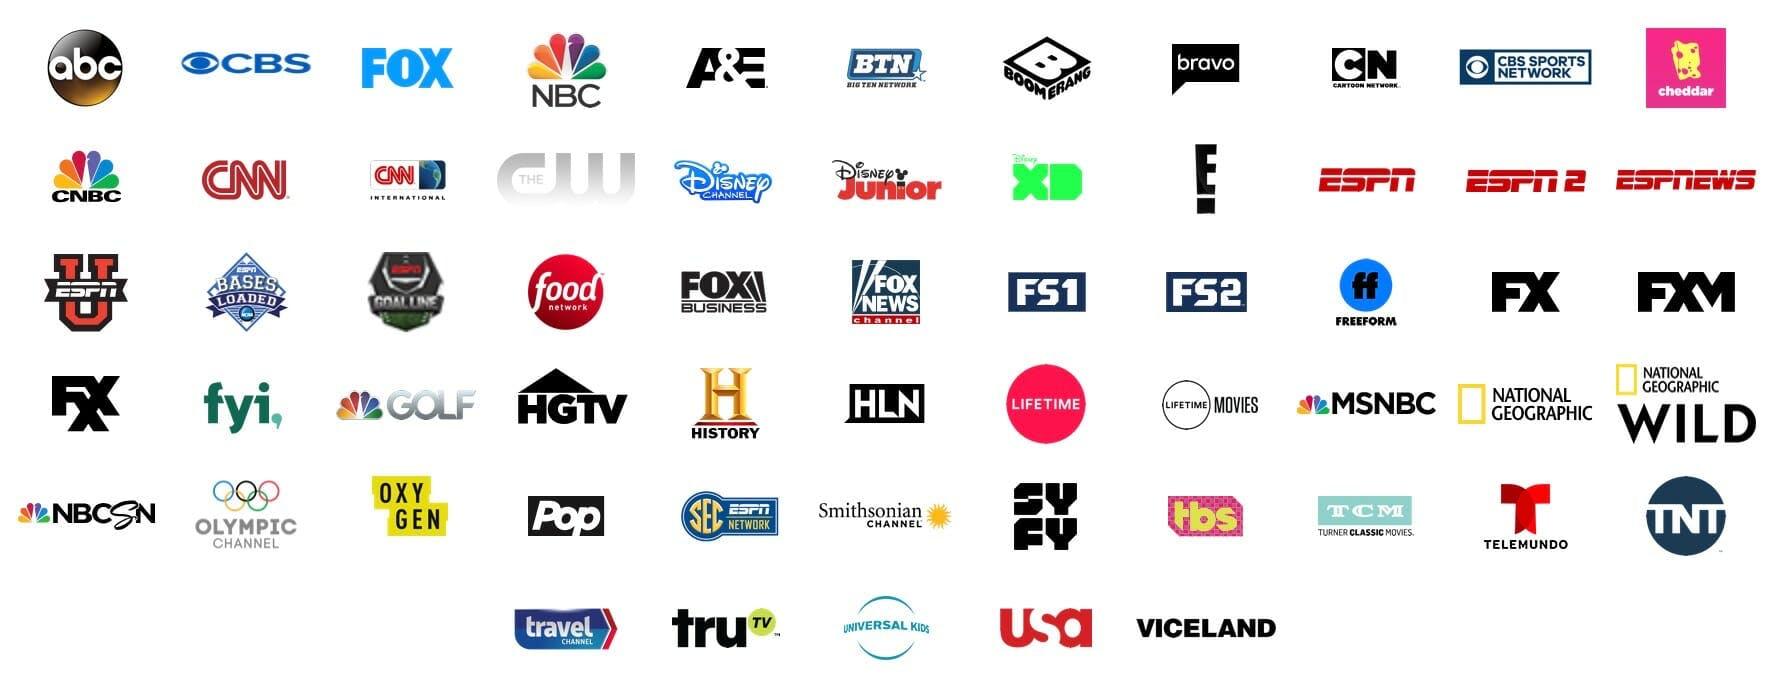 watch world series 2018 live stream hulu live tv channels